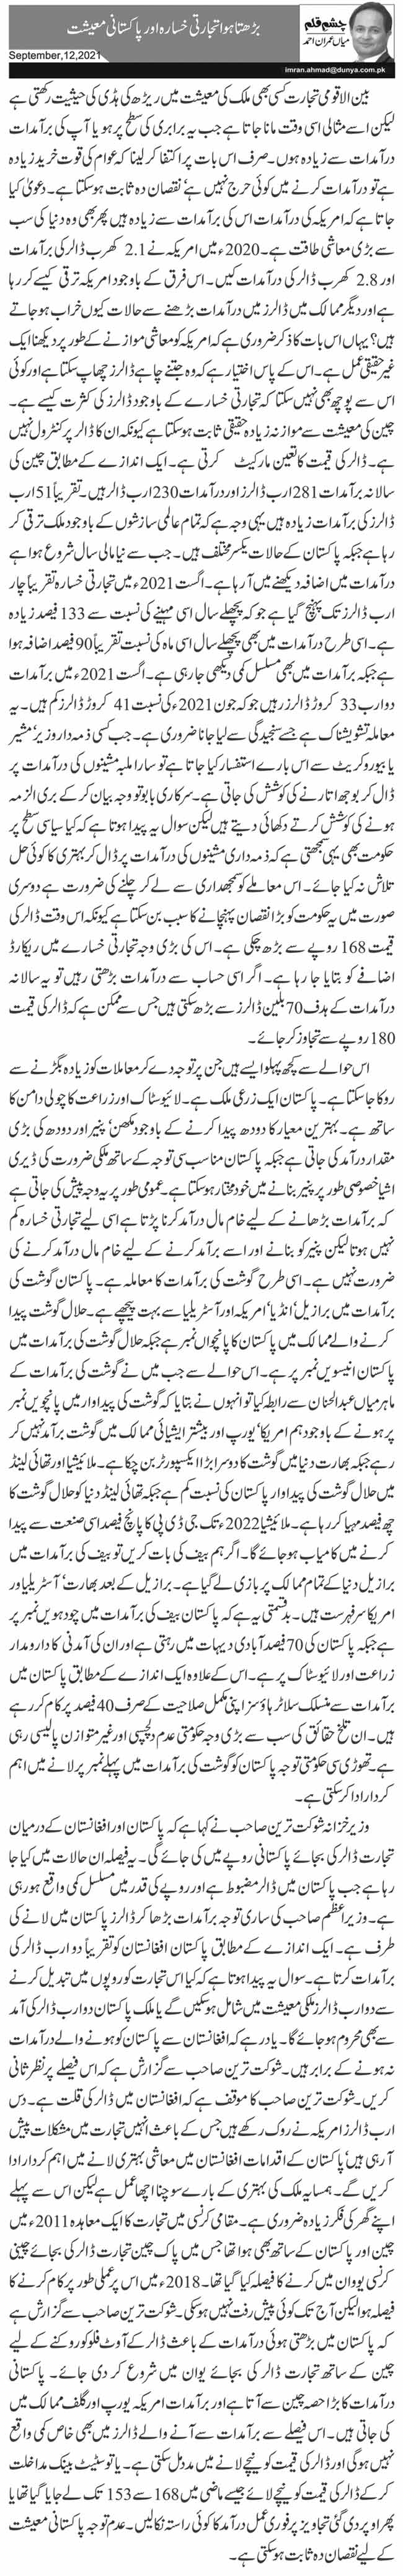 بڑھتا ہو ا تجارتی خسارہ اور پاکستانی معیشت